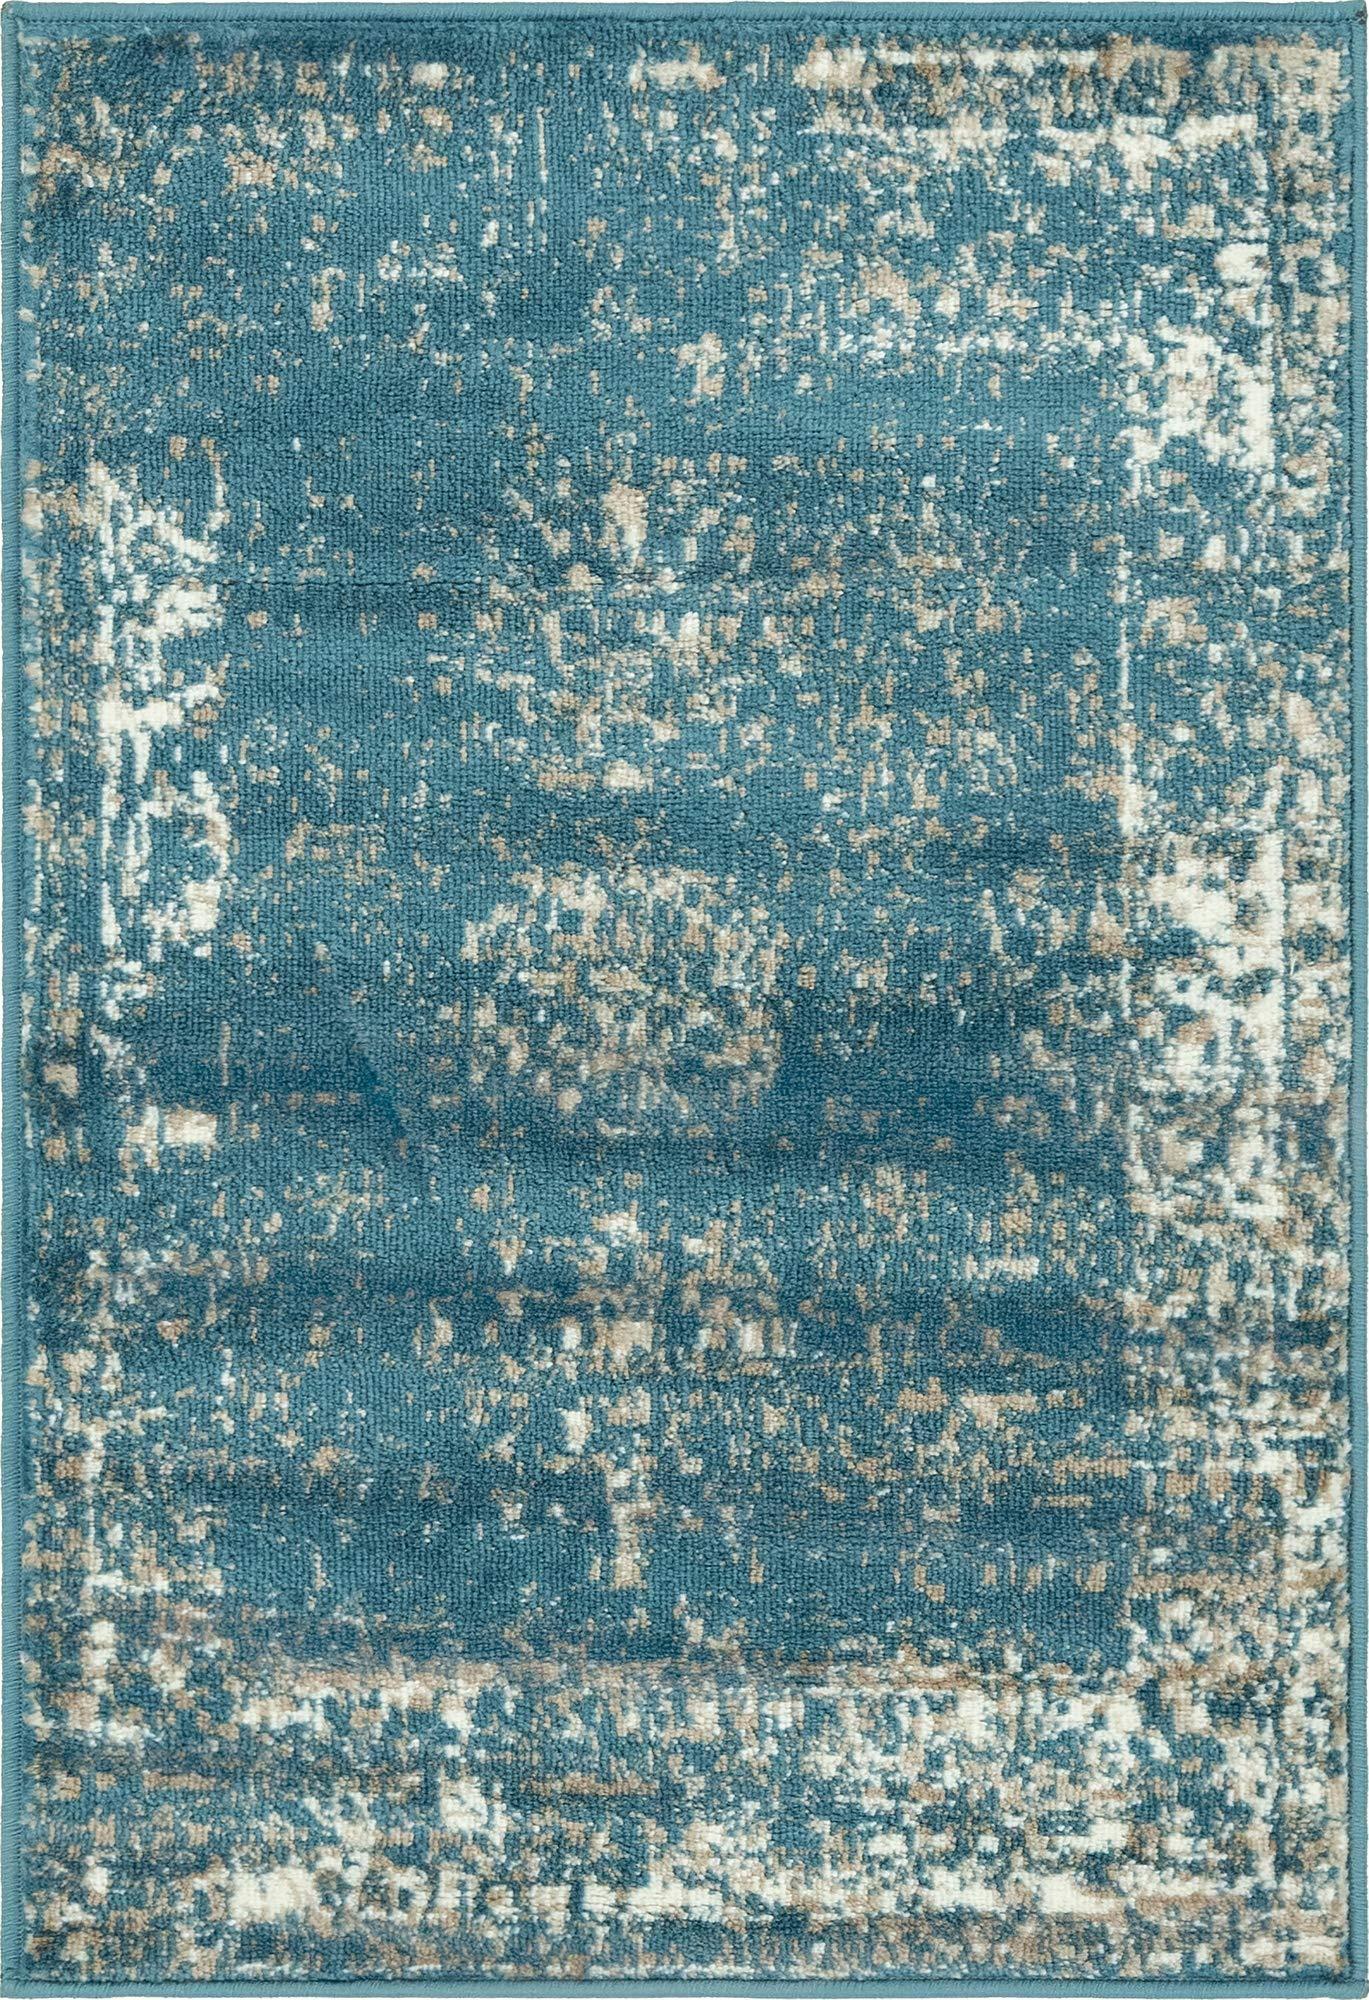 Unique Loom 3141397 Area Rug, 2' x 3' Rectangle, Blue